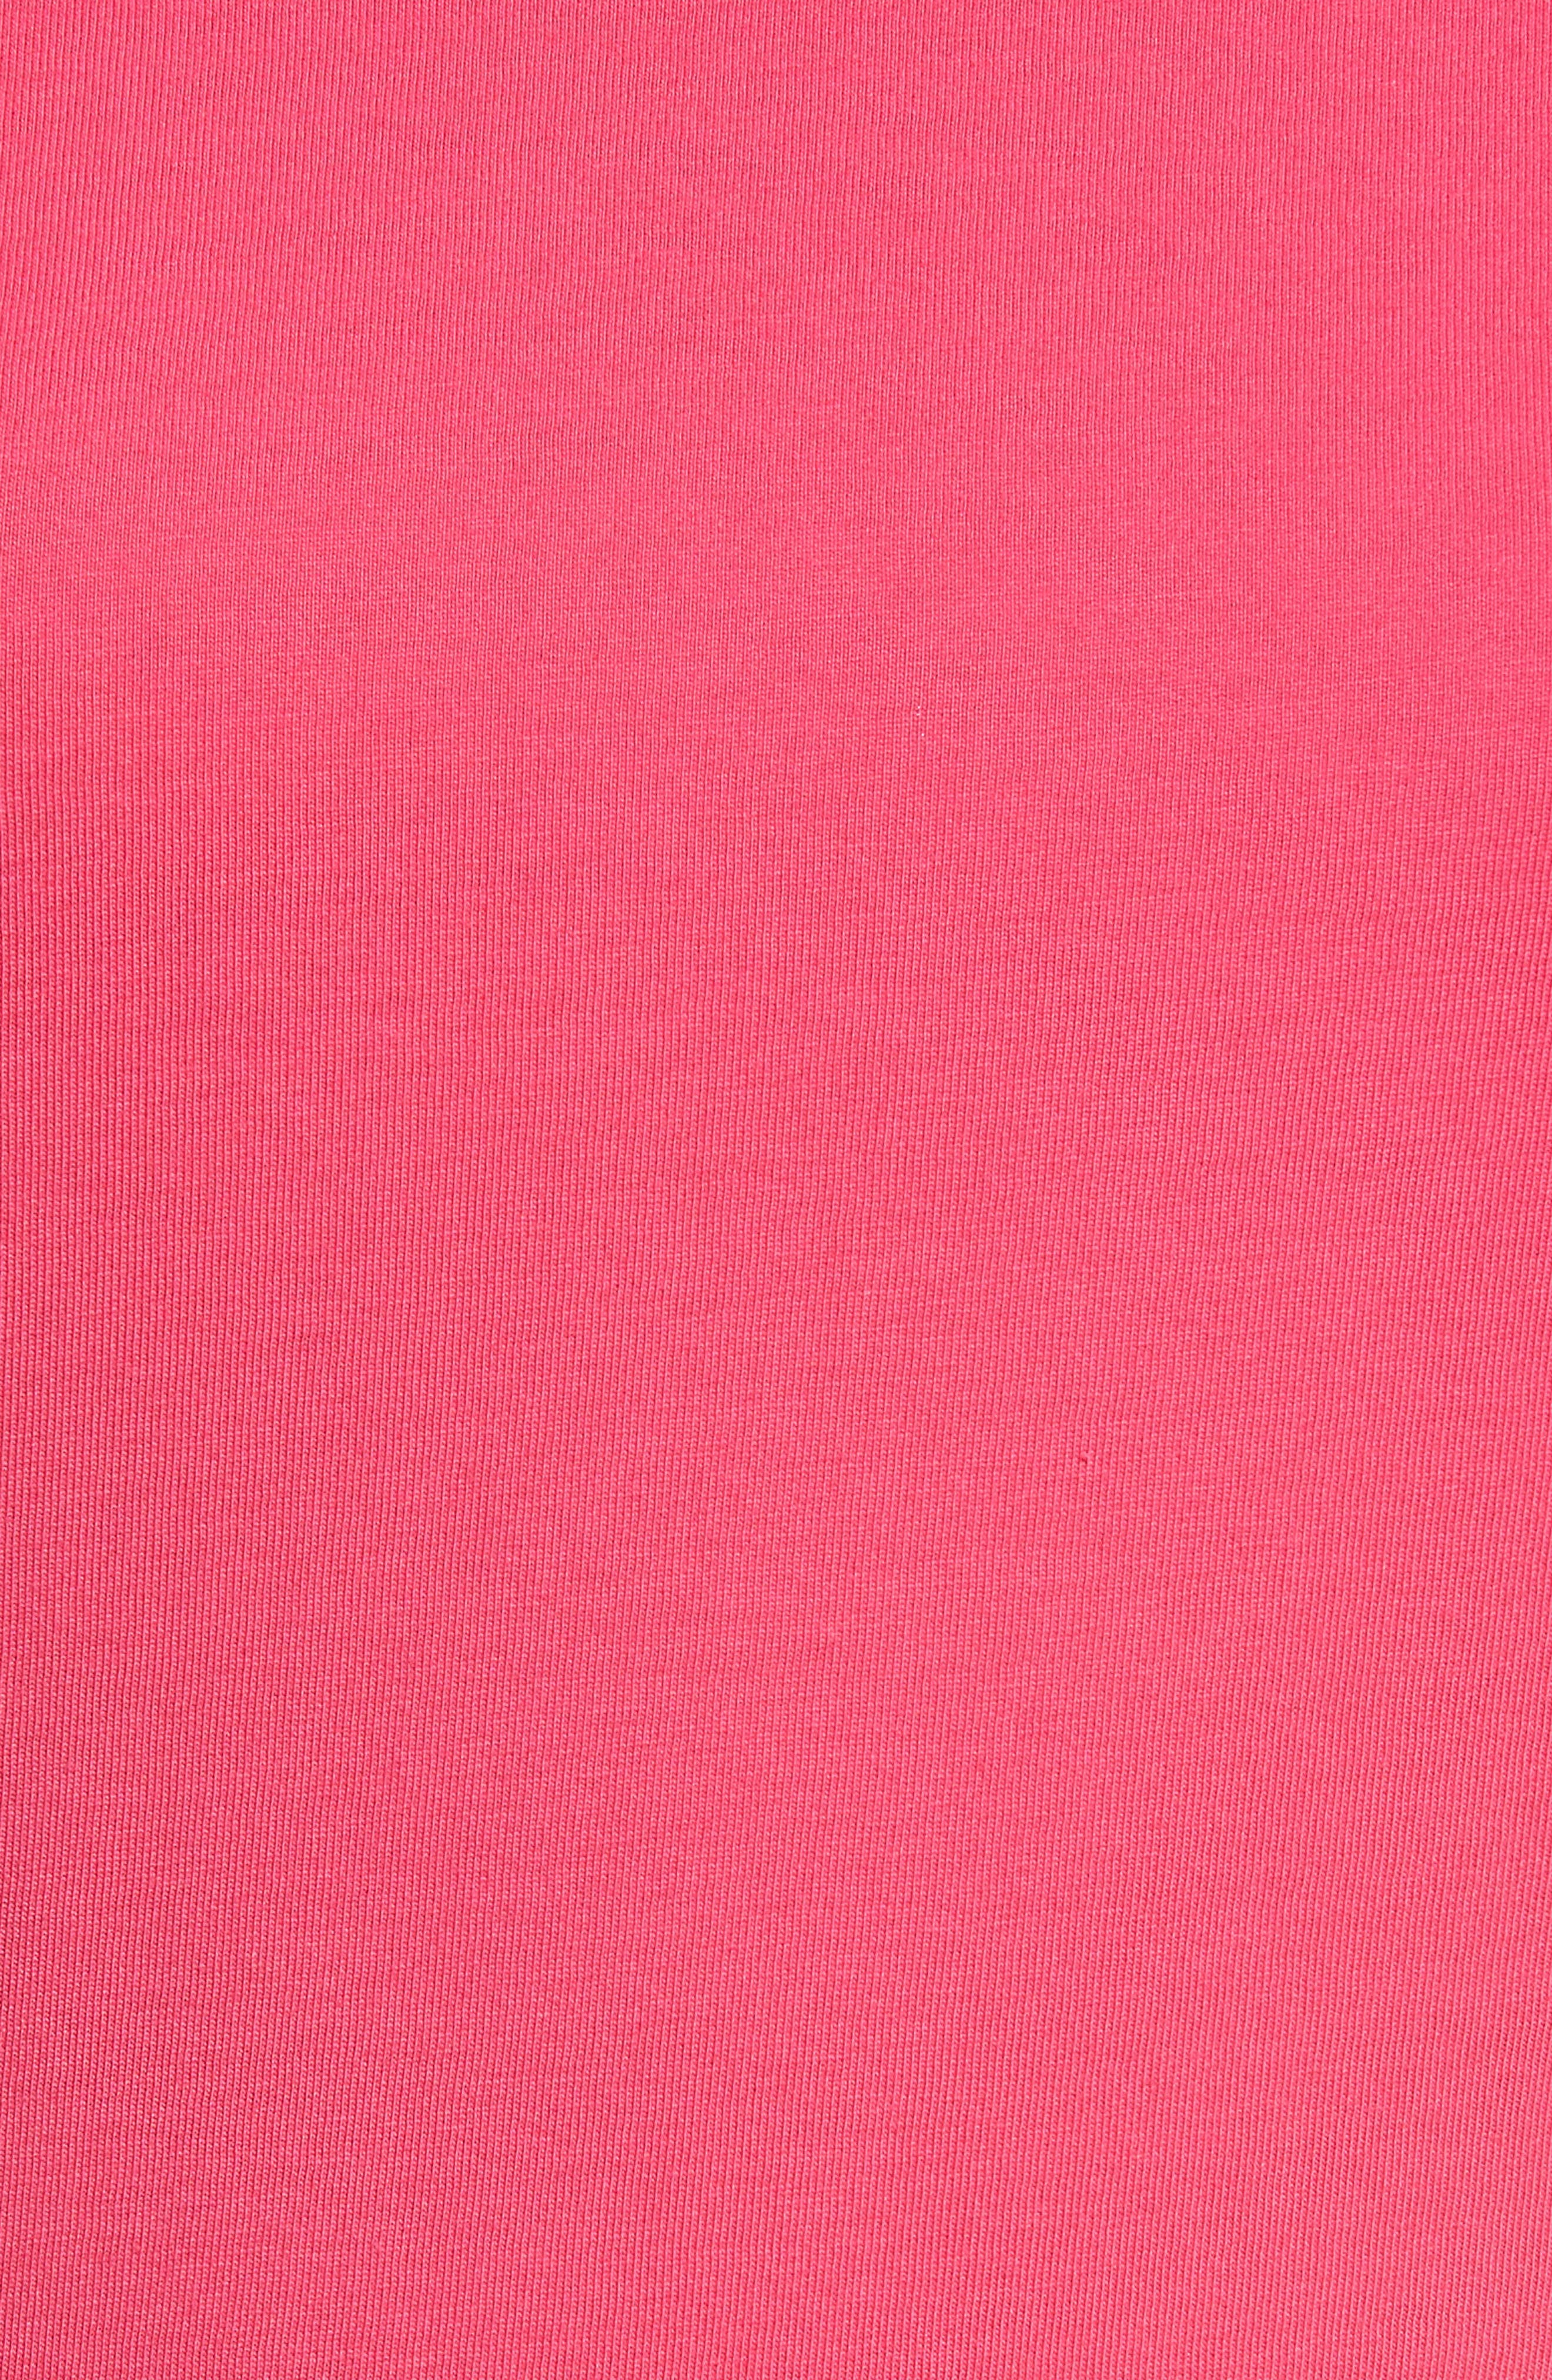 Ruffle Sleeve Tee,                             Alternate thumbnail 6, color,                             Pink Cabaret